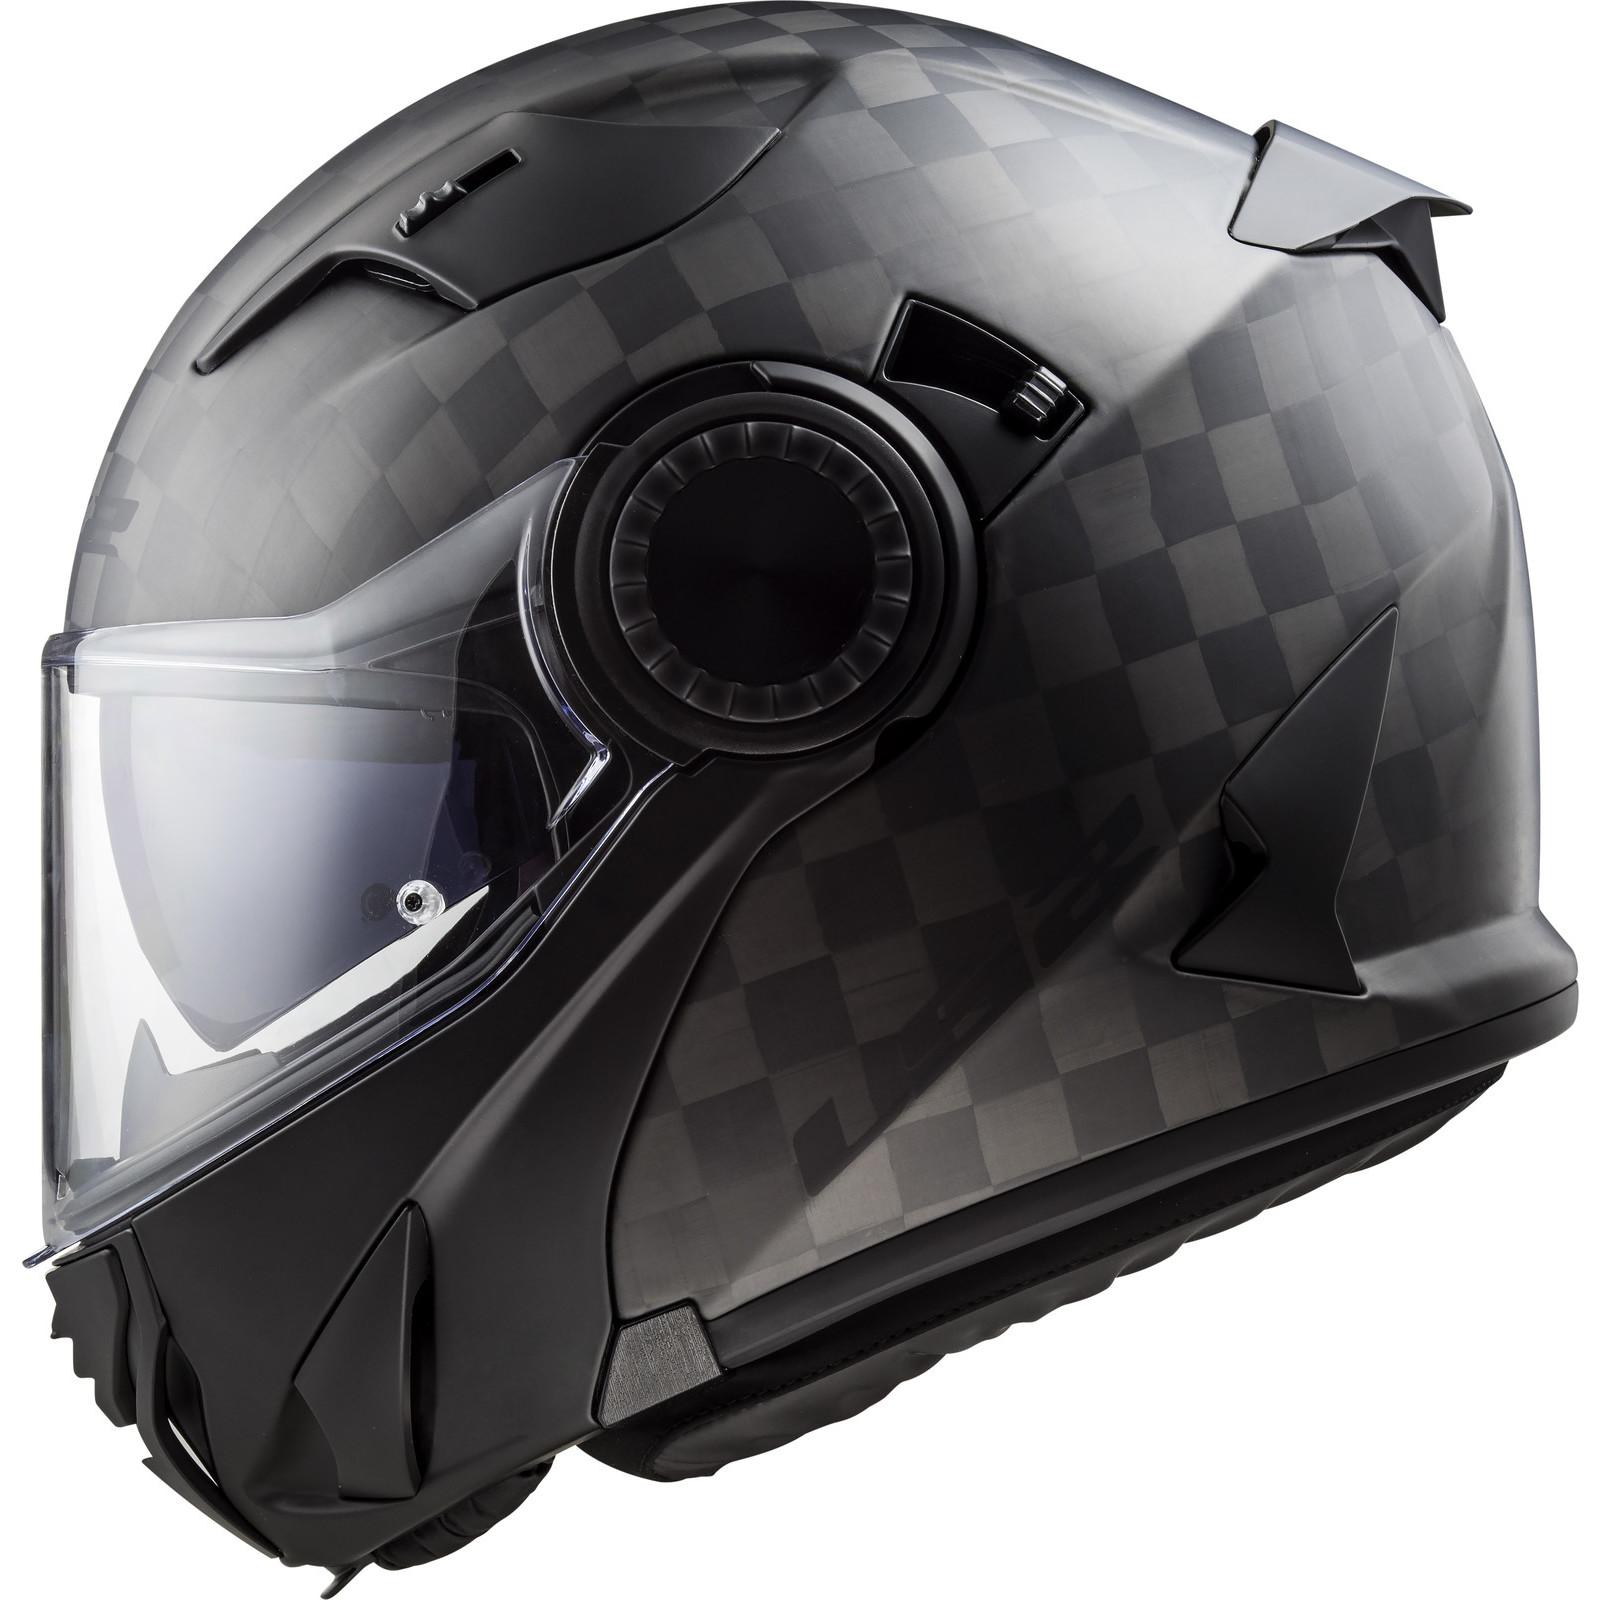 Ls2 Ff313 Vortex Solid Motorcycle Helmet Free Visor Crash